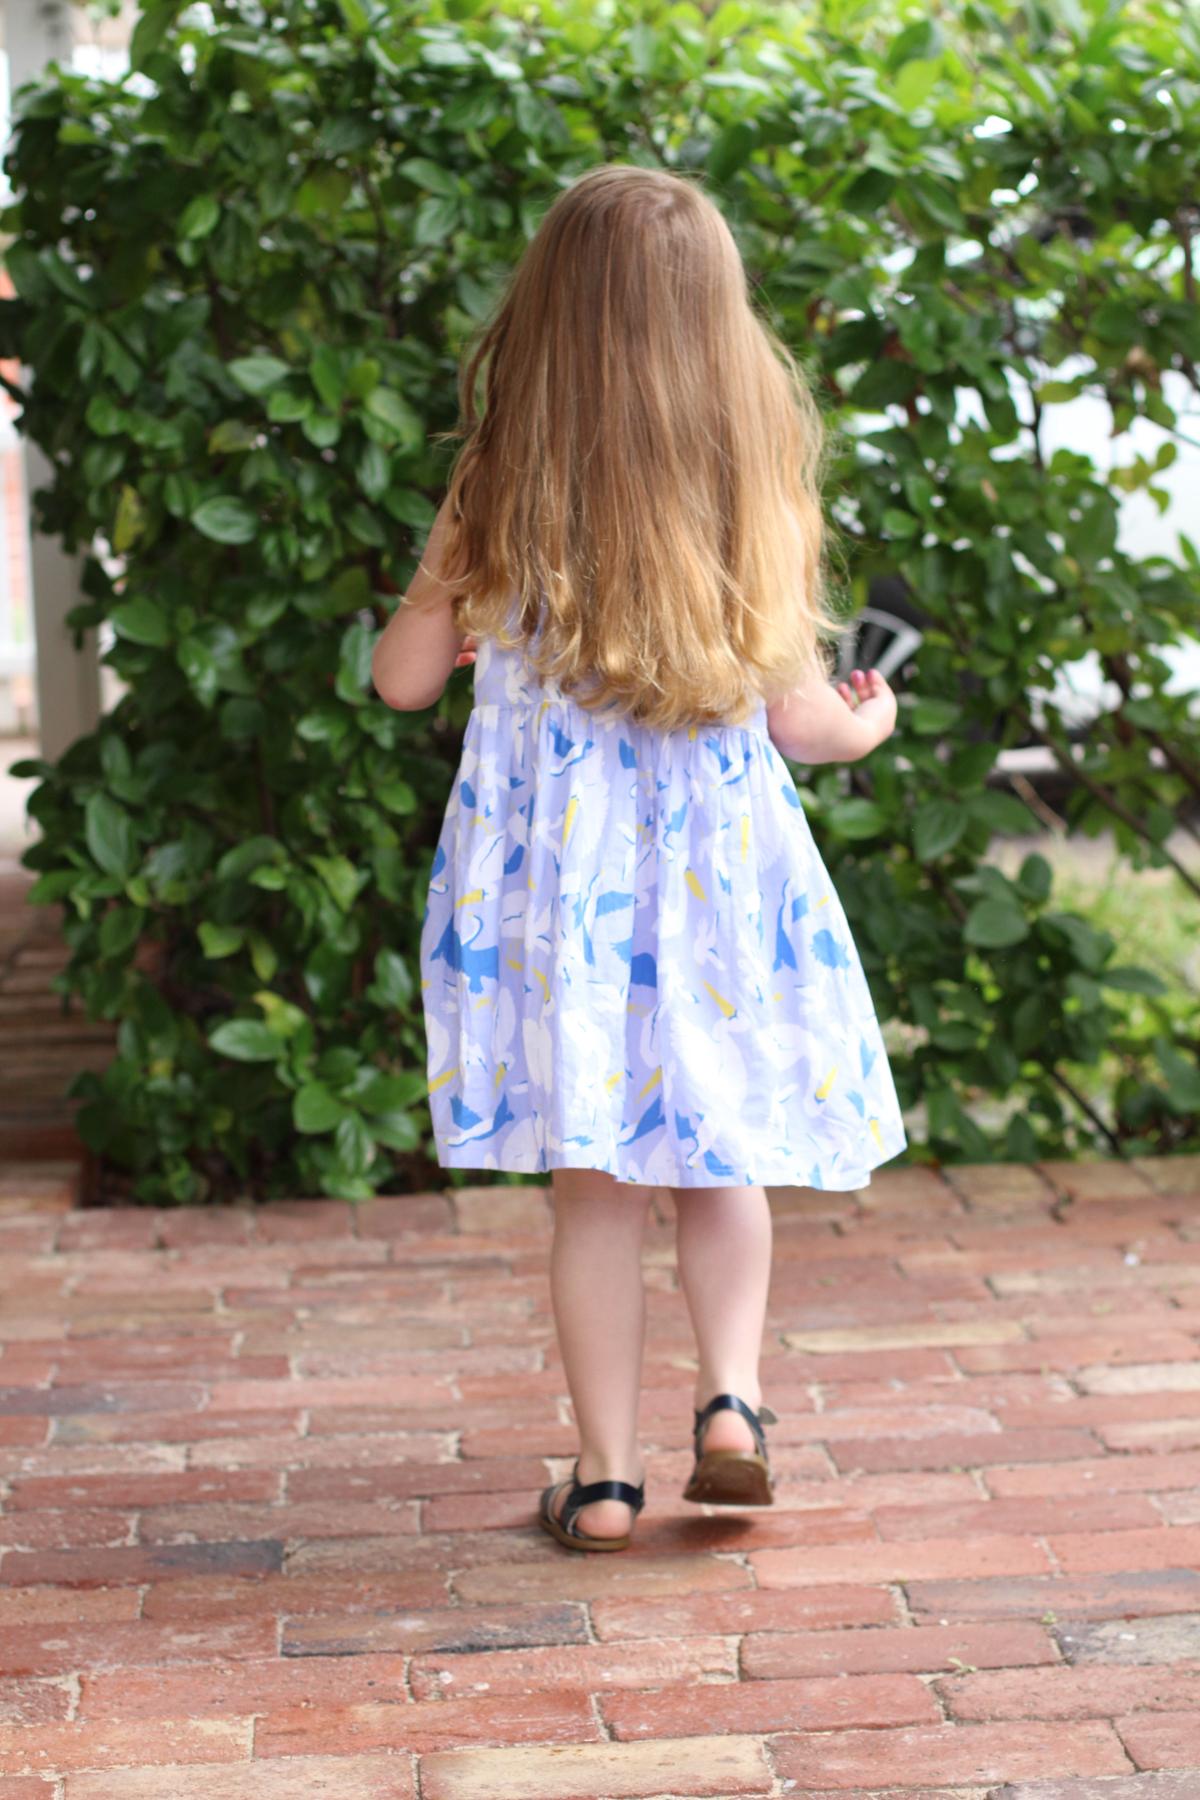 Birdie's Mini Eucalypt Dress Hack in Ellie Whittaker Seabirds fabric! // Megan Nielsen Design Diary